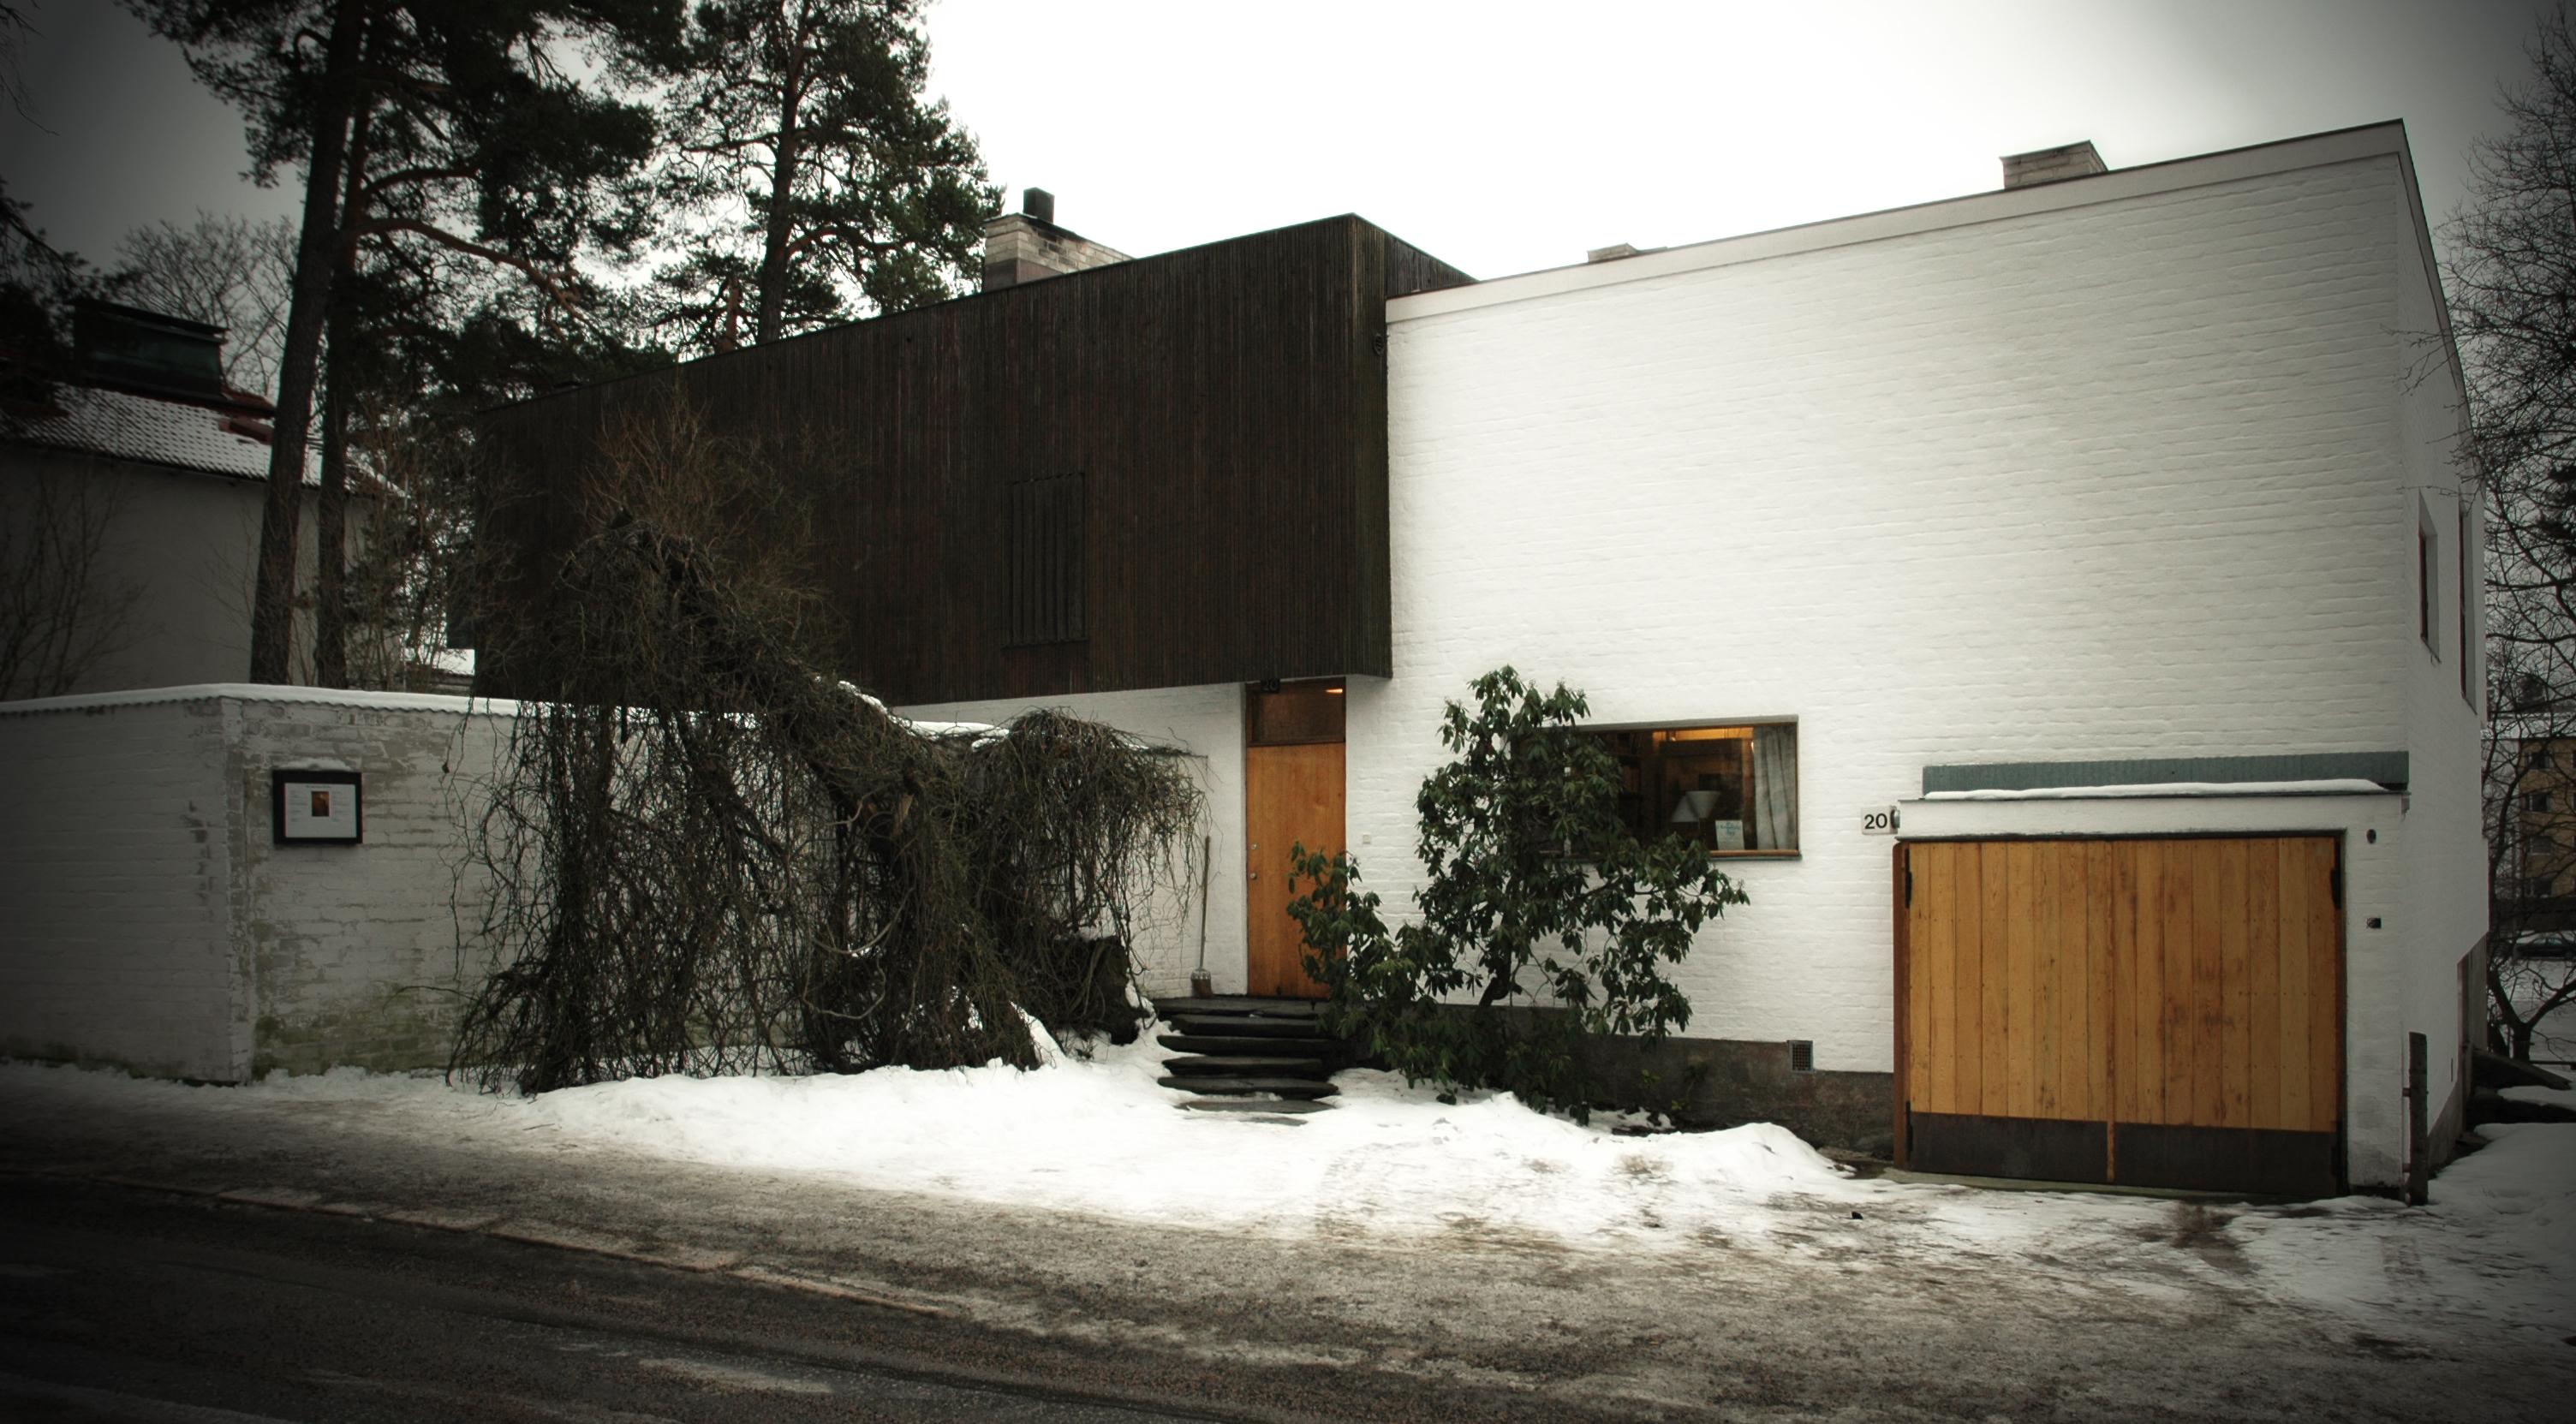 Alvar aalto house alvar aalto helsinki finlandia archher for The aalto house